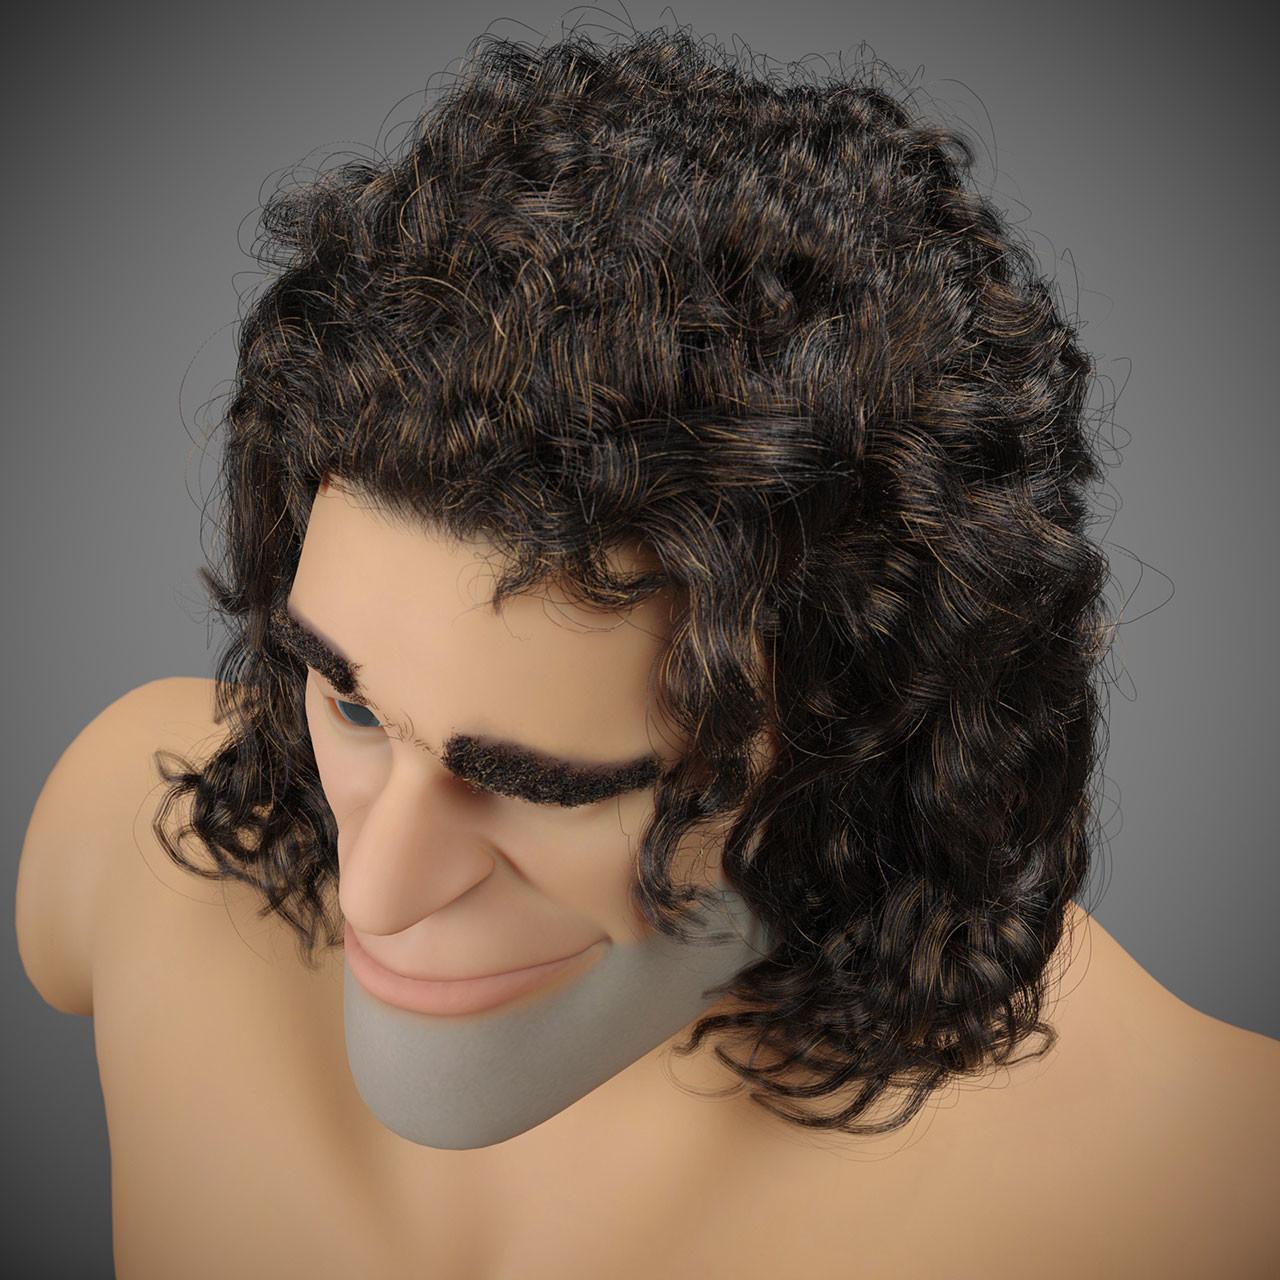 Andrew krivulya joseph hairstyle 1 r 04 by andrew krivulya